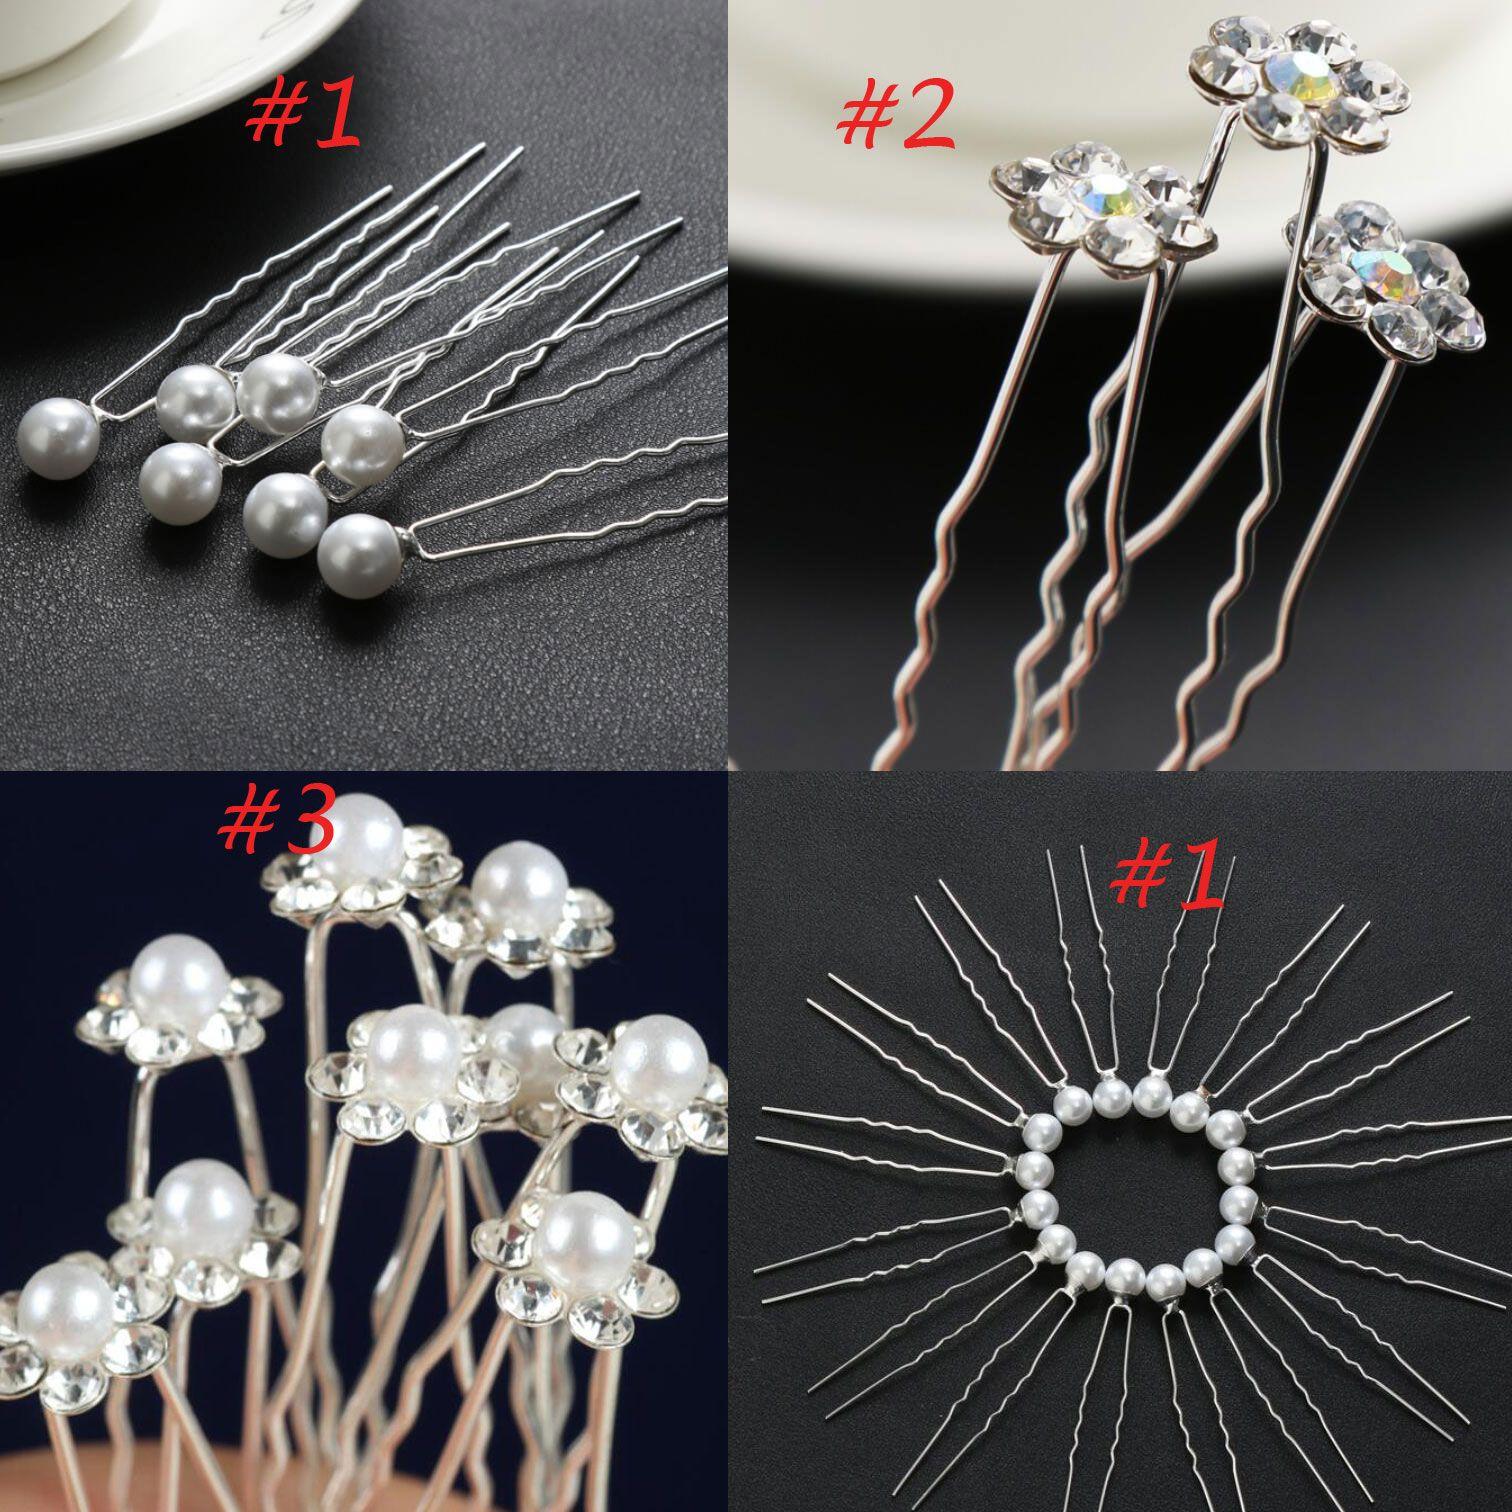 New Arrival 3 StylesWedding Hair Pins for Bridal Crystals Pearls Bridal Hair Pins Headpieces U Hairpin Fork Hair Pearl Flower